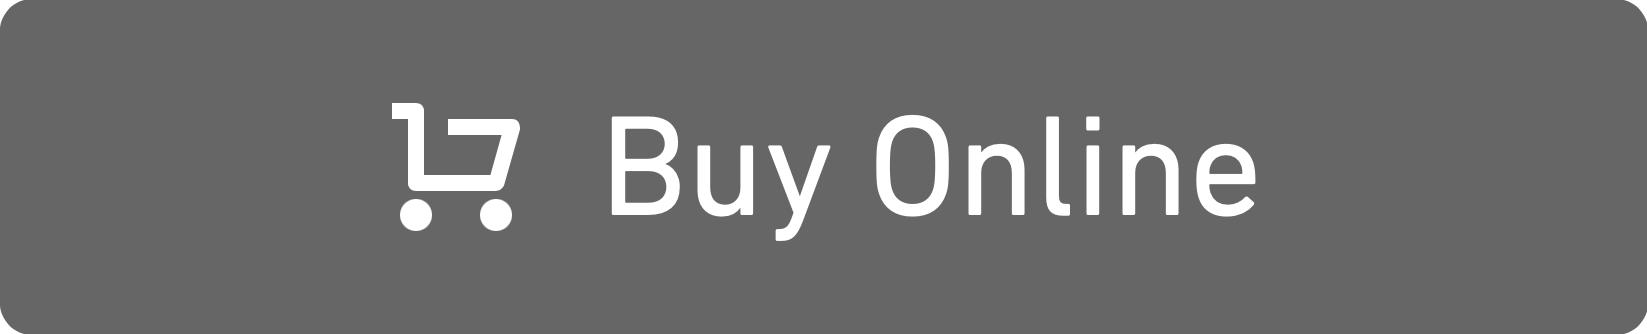 humanscale-buy-online